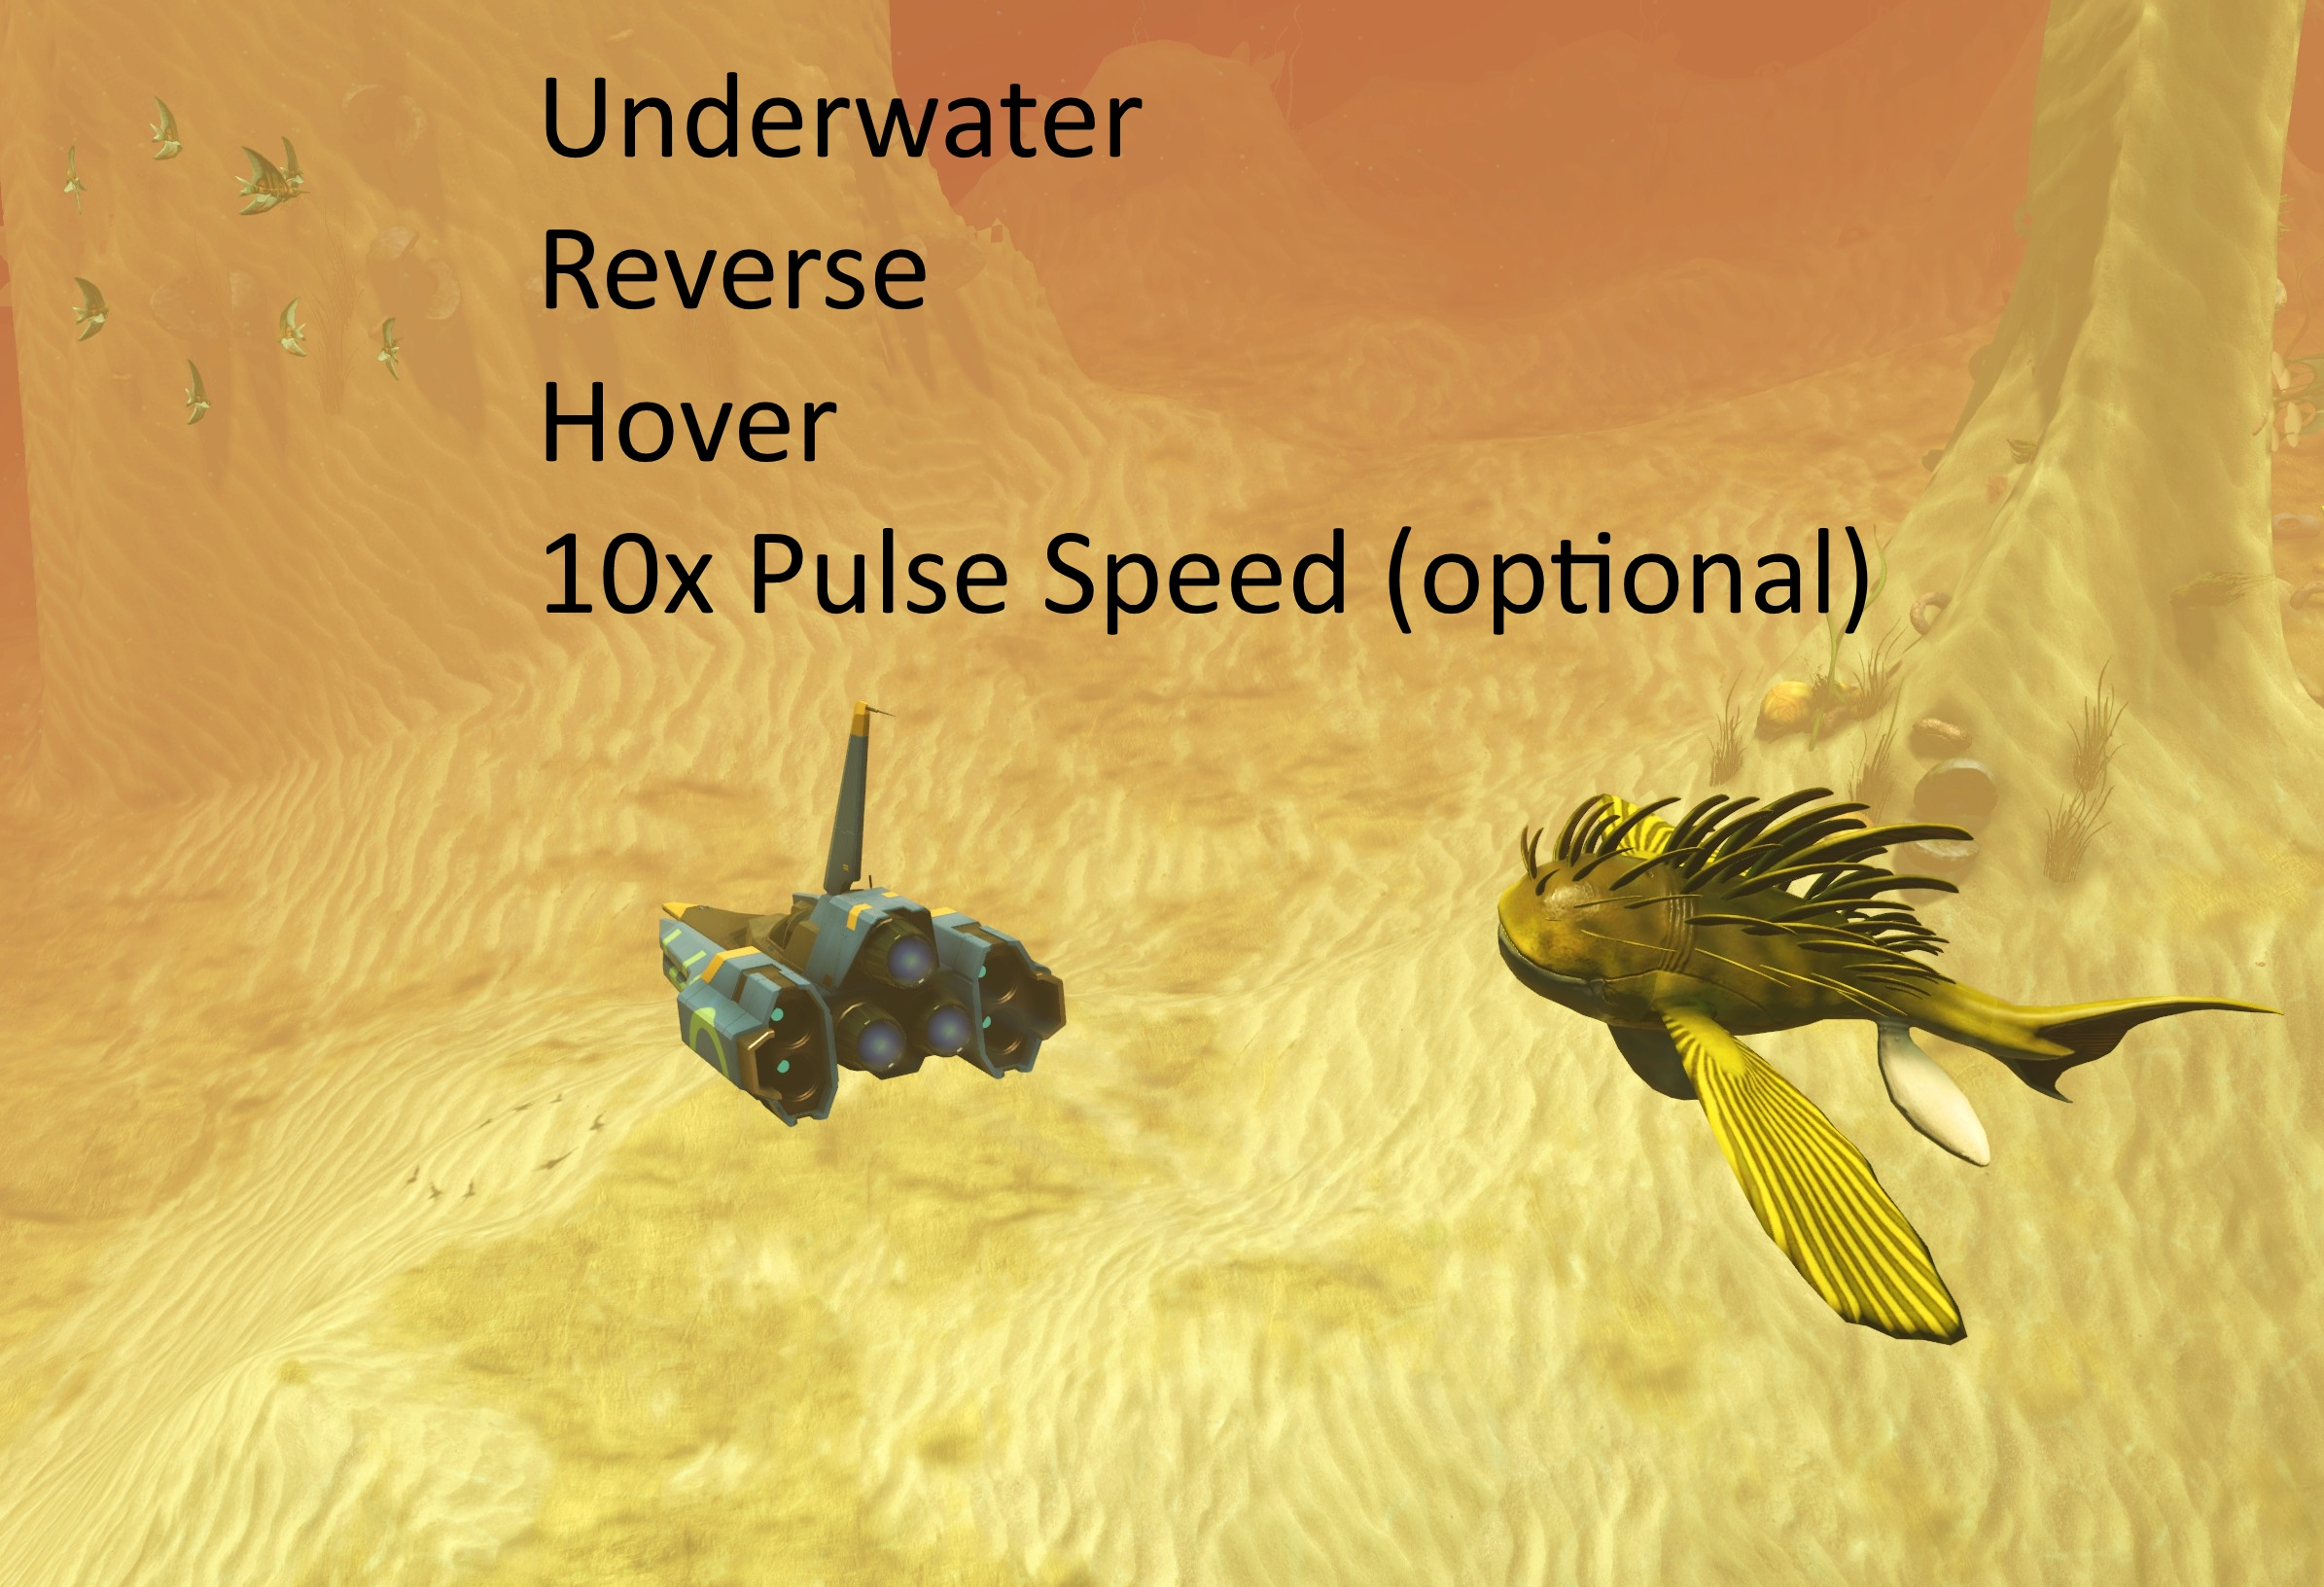 Underwater + Reverse + Hover Flight + 10x Pulse Speed (optional)